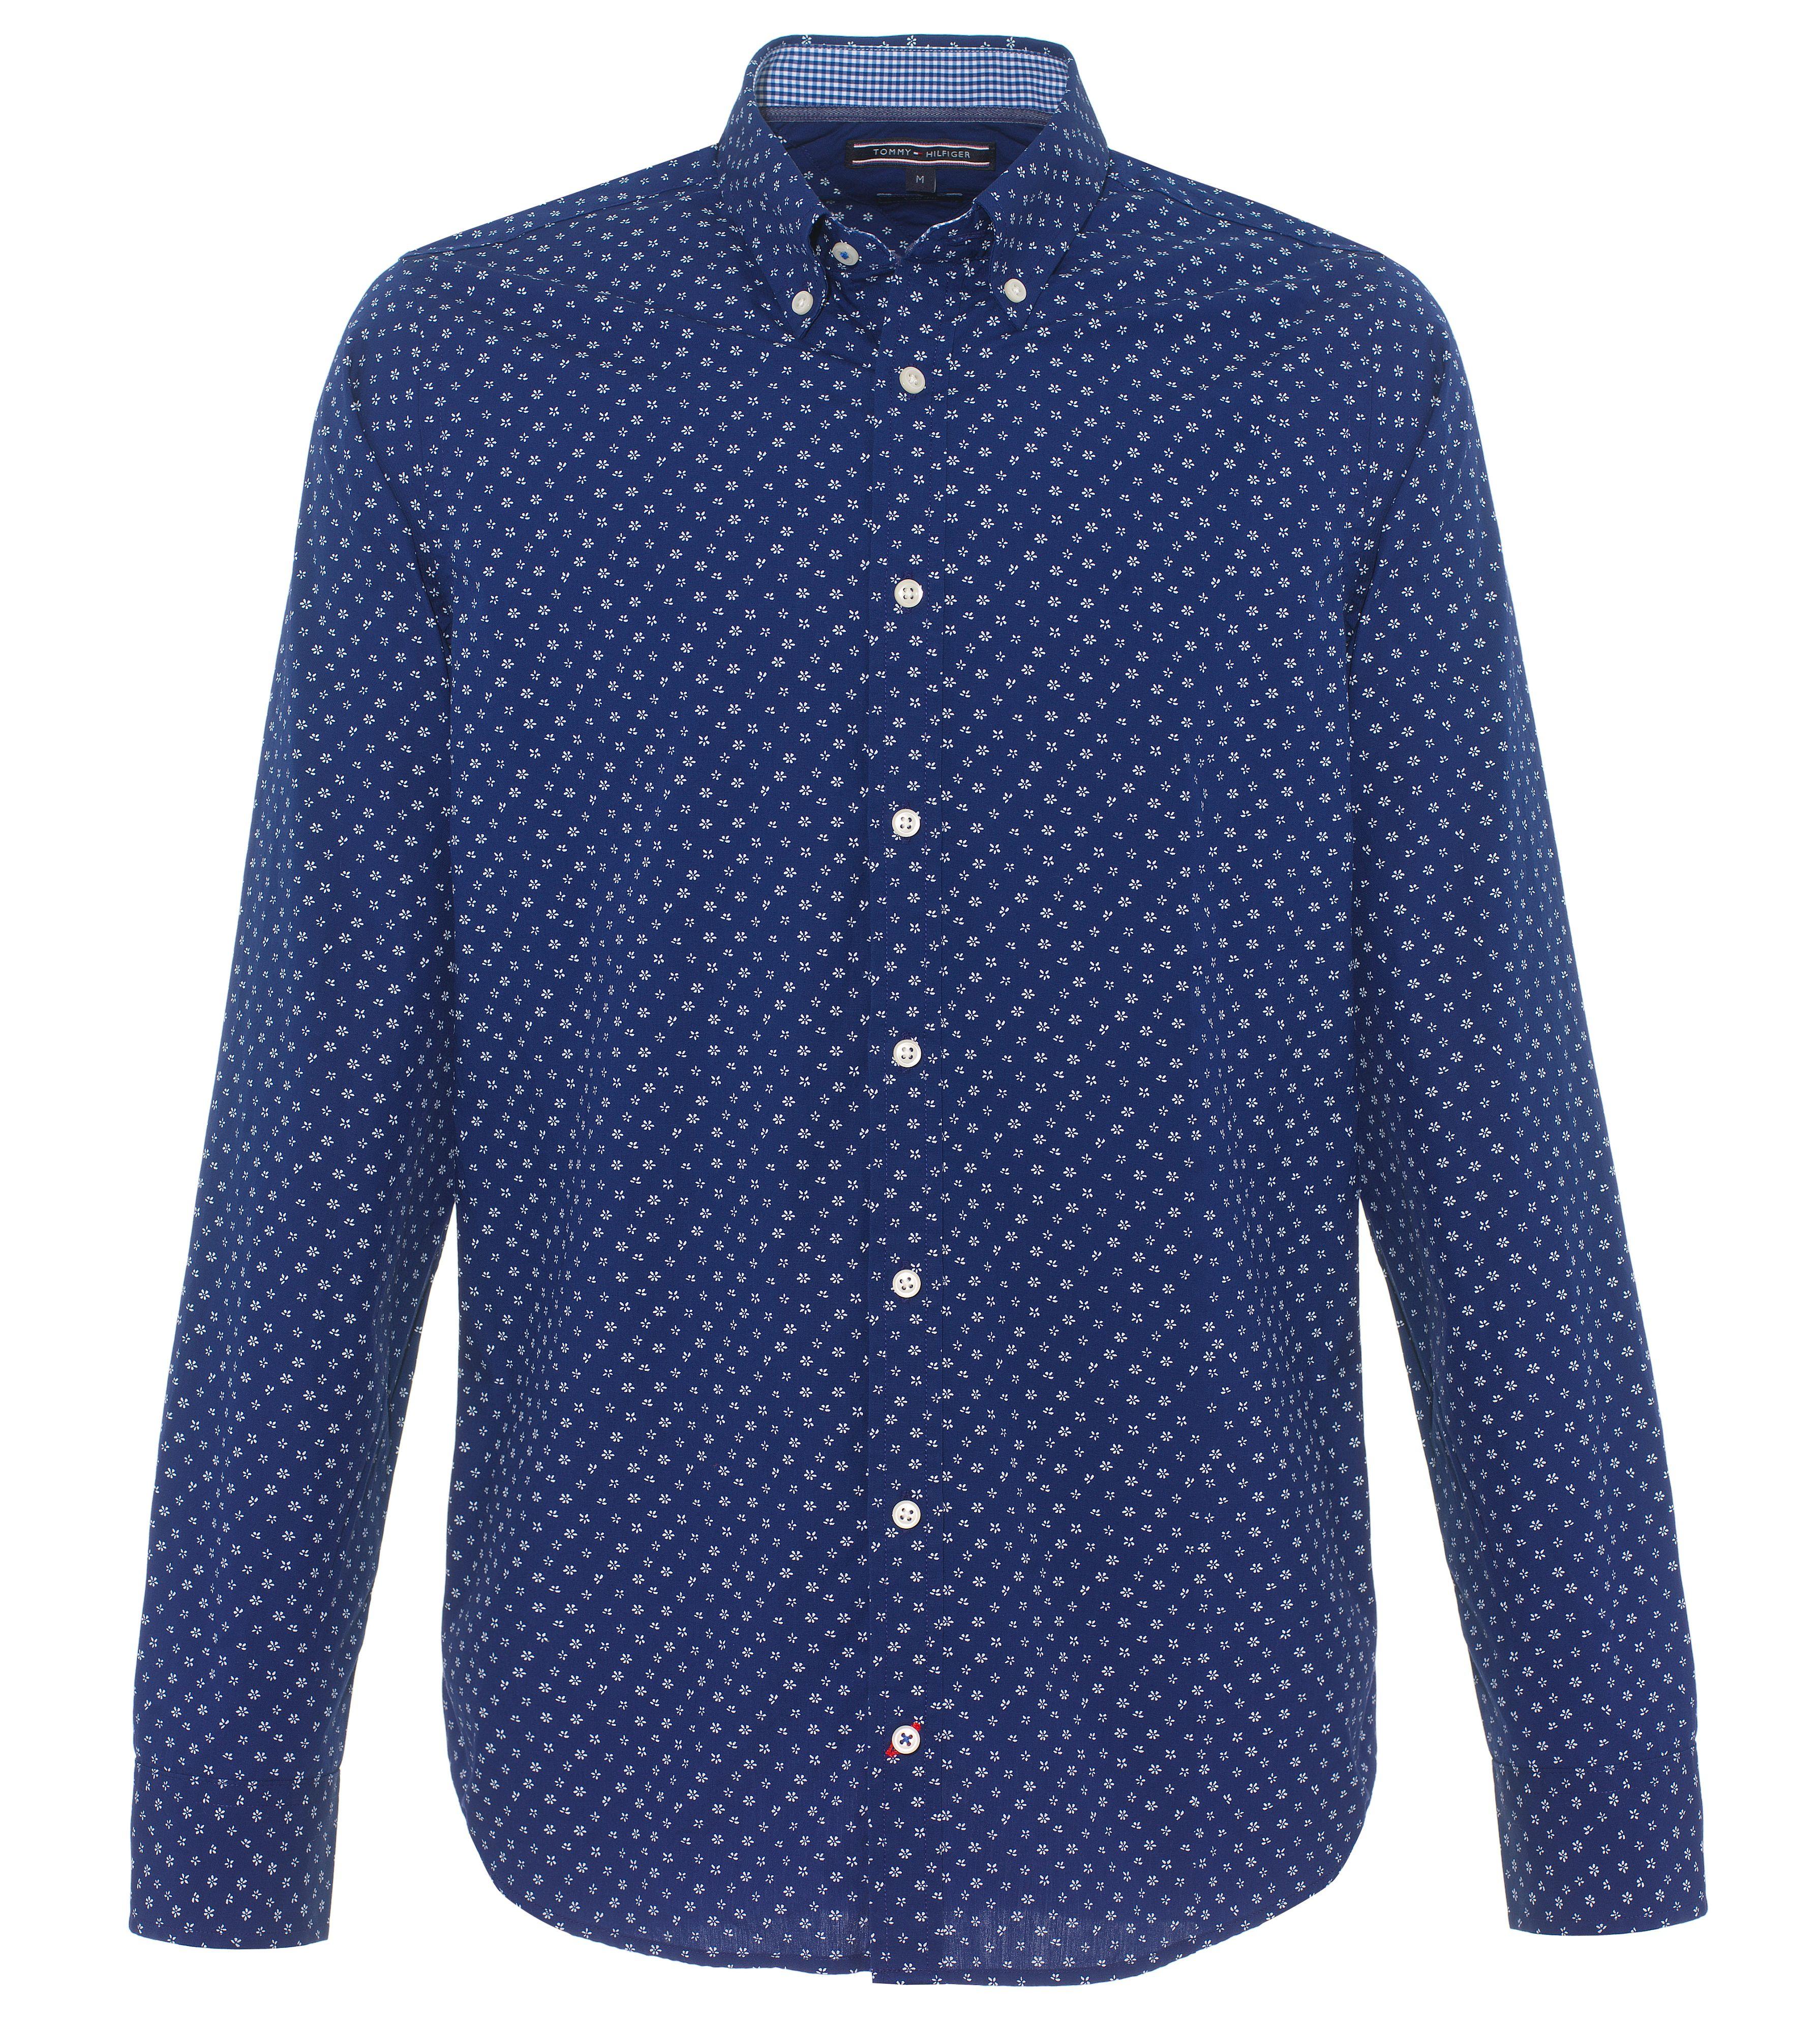 Tommy Hilfiger Fonda Pattern Long Sleeve Button Down Shirt